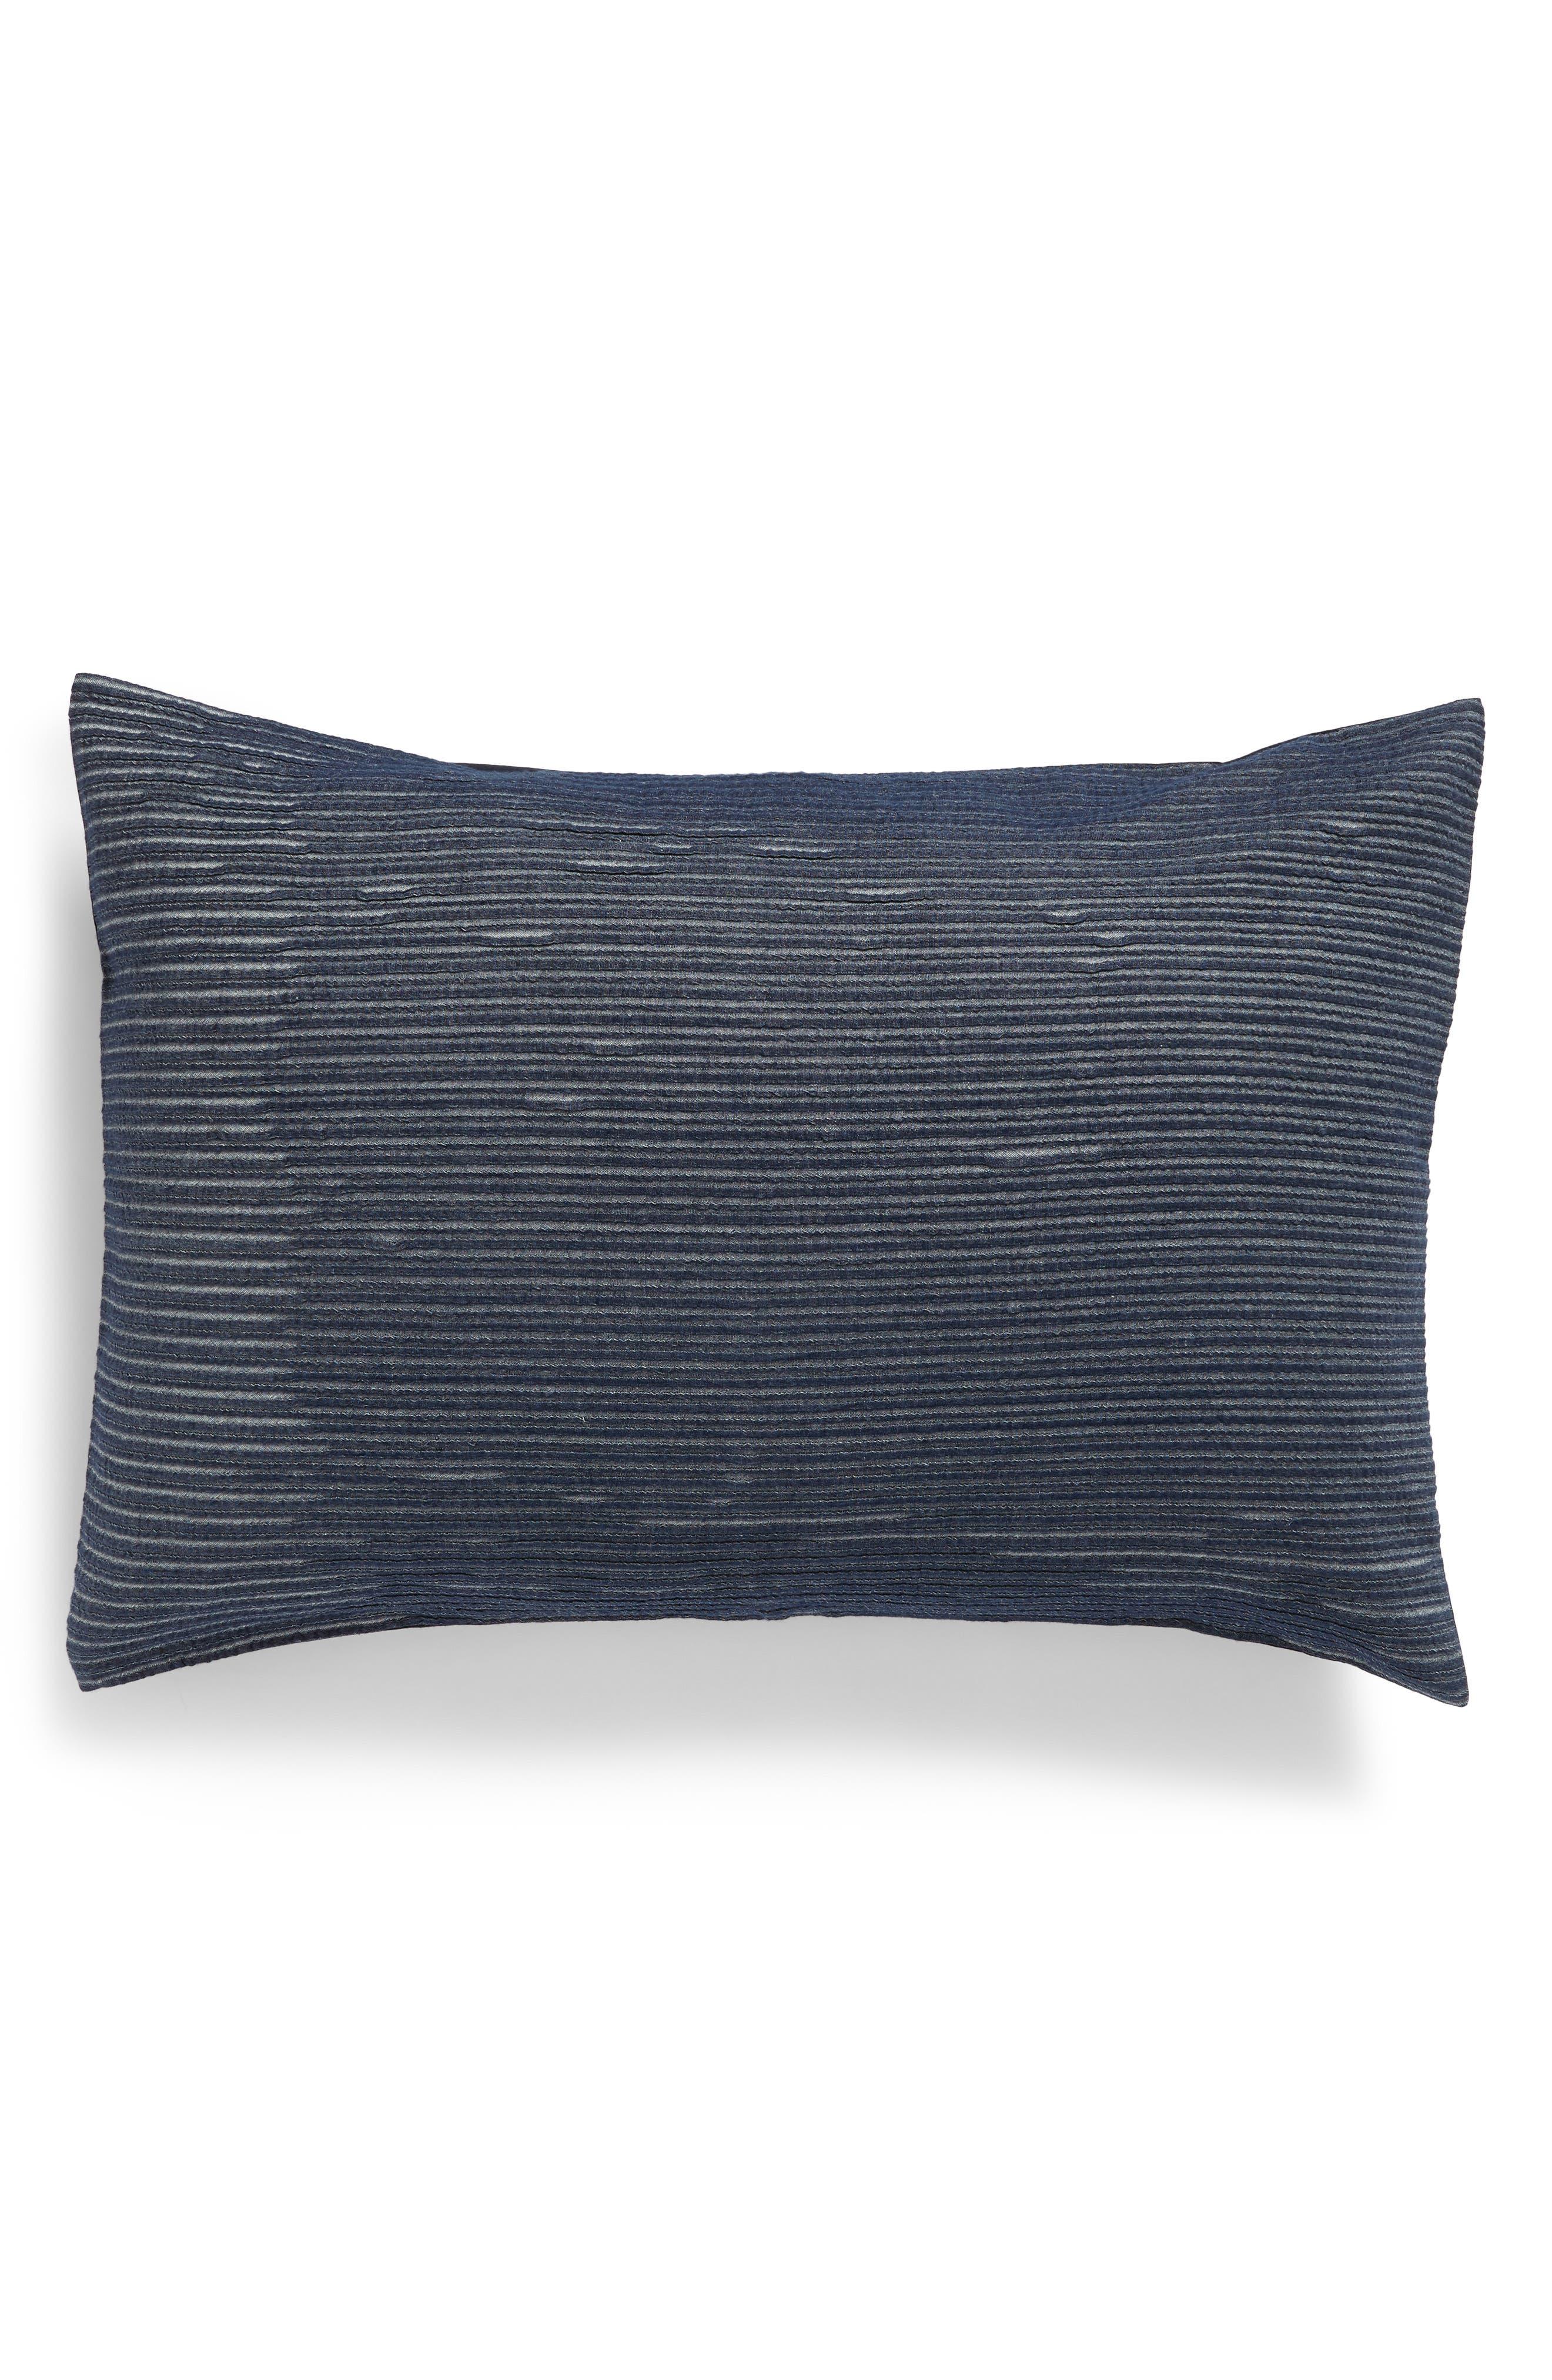 TREASURE & BOND Stripe Texture Sham, Main, color, NAVY BLUE